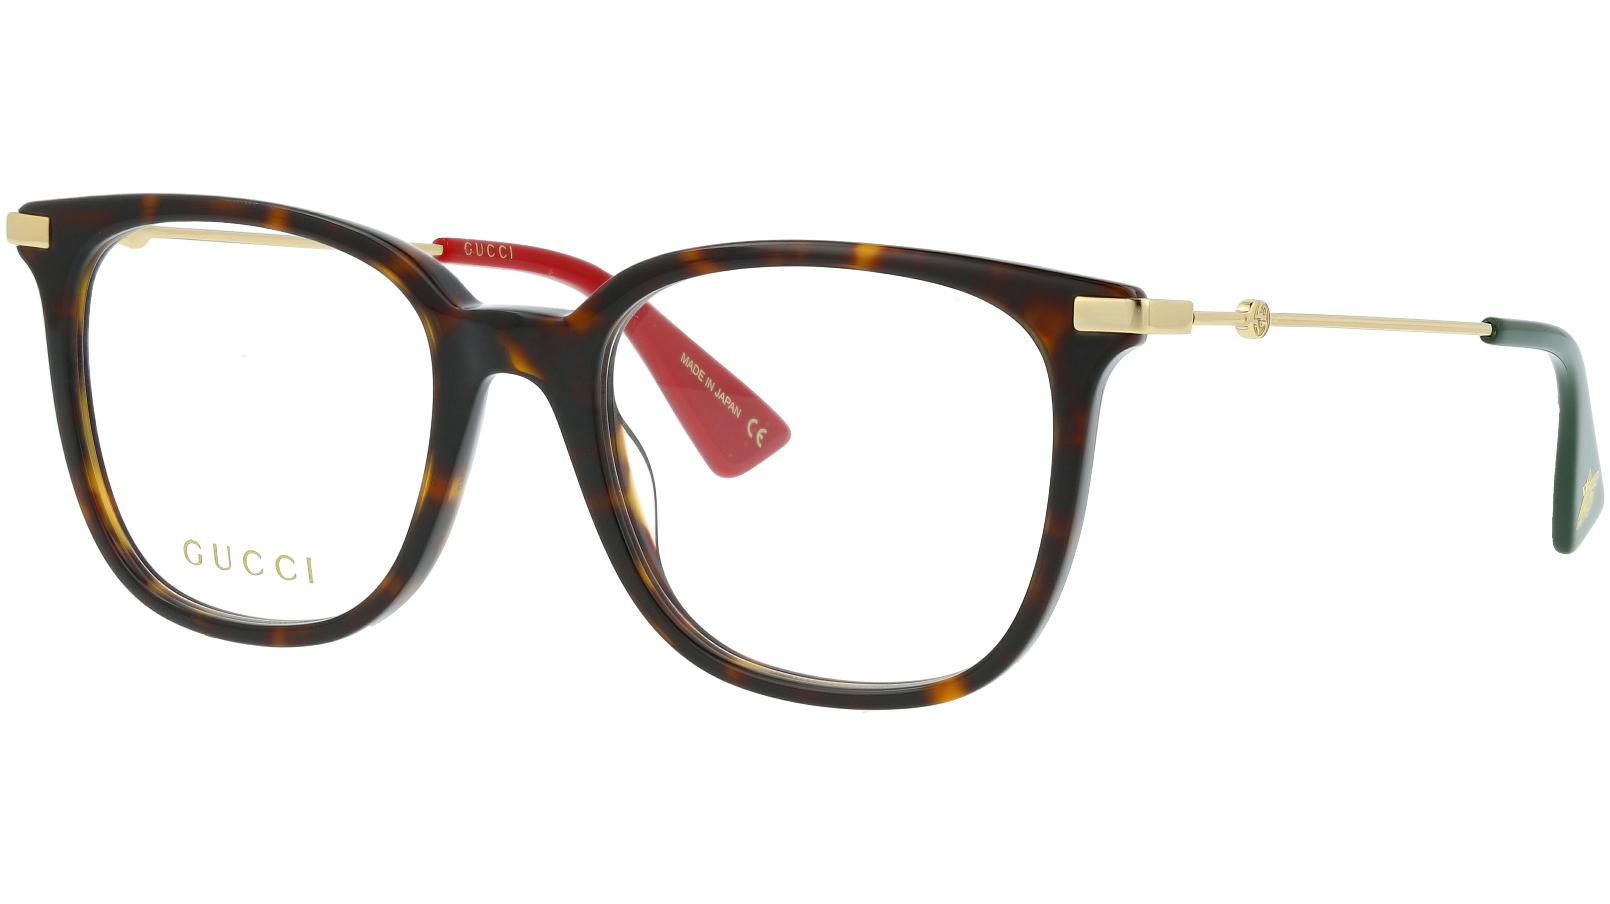 GUCCI GG0110O 007 51 HAVANA Glasses